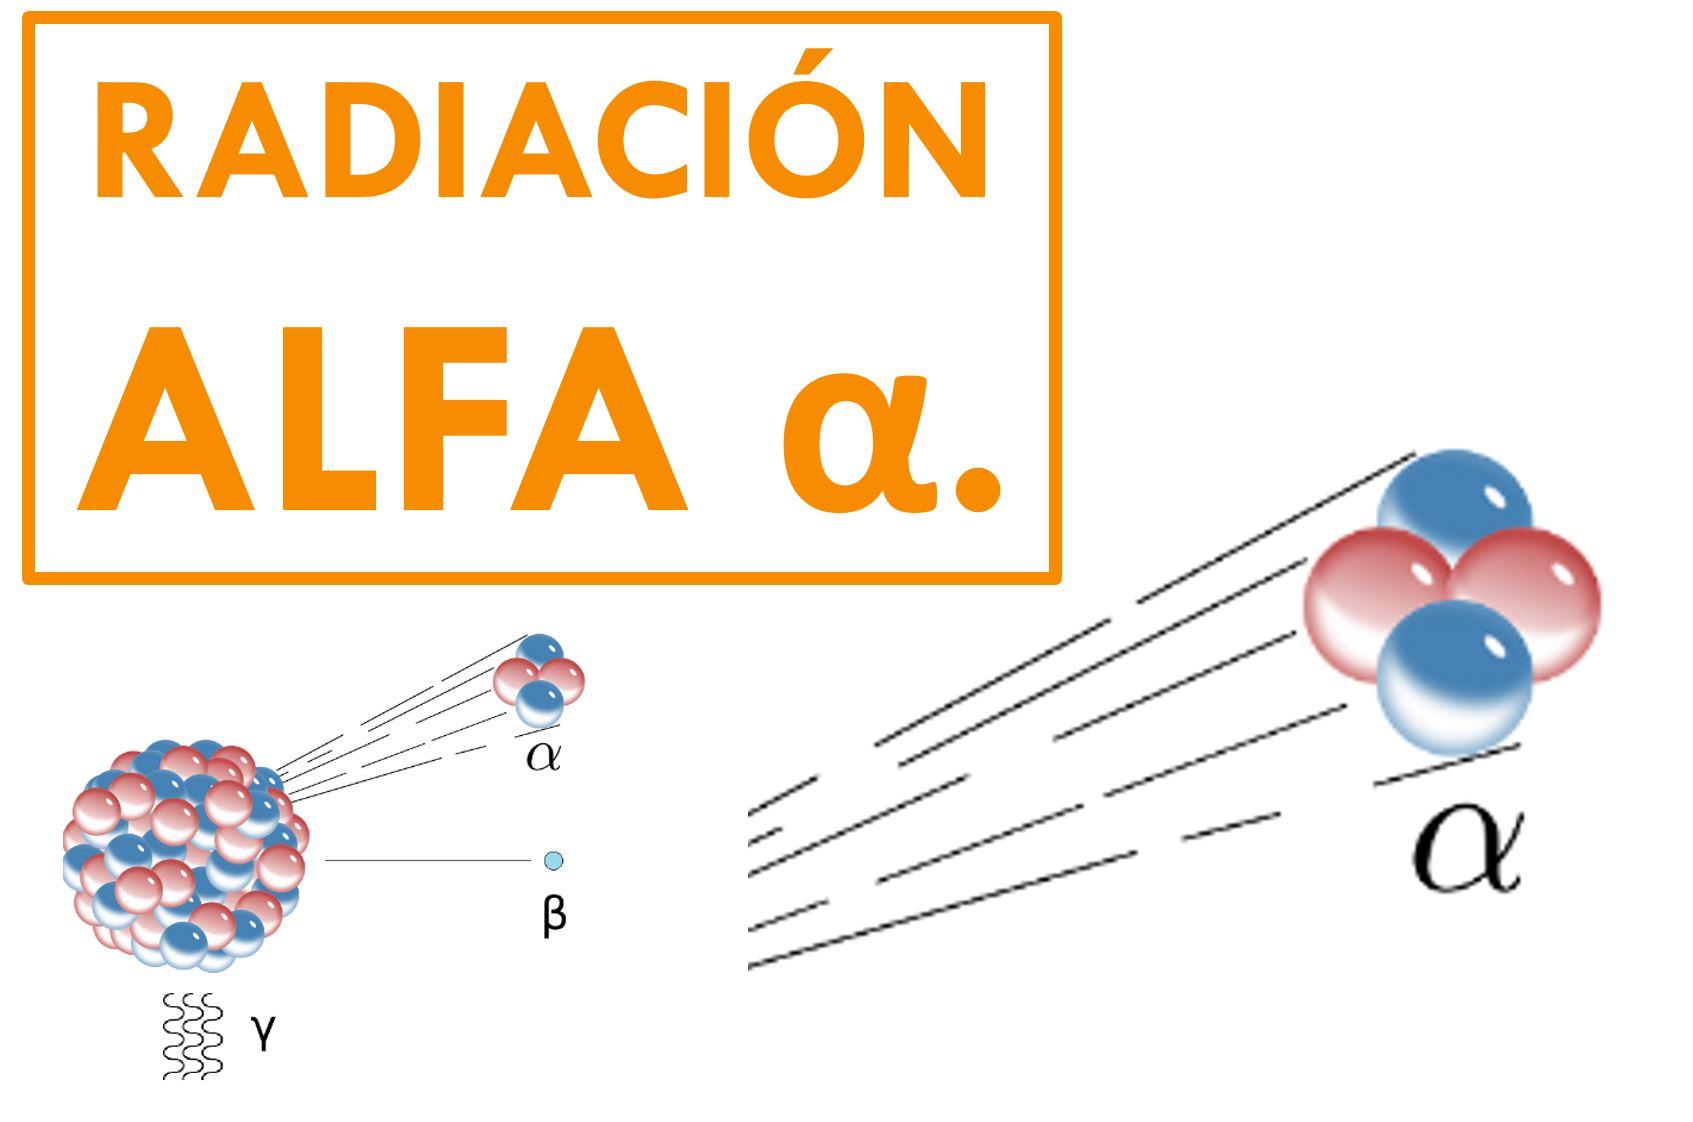 RADIACION ALFA.